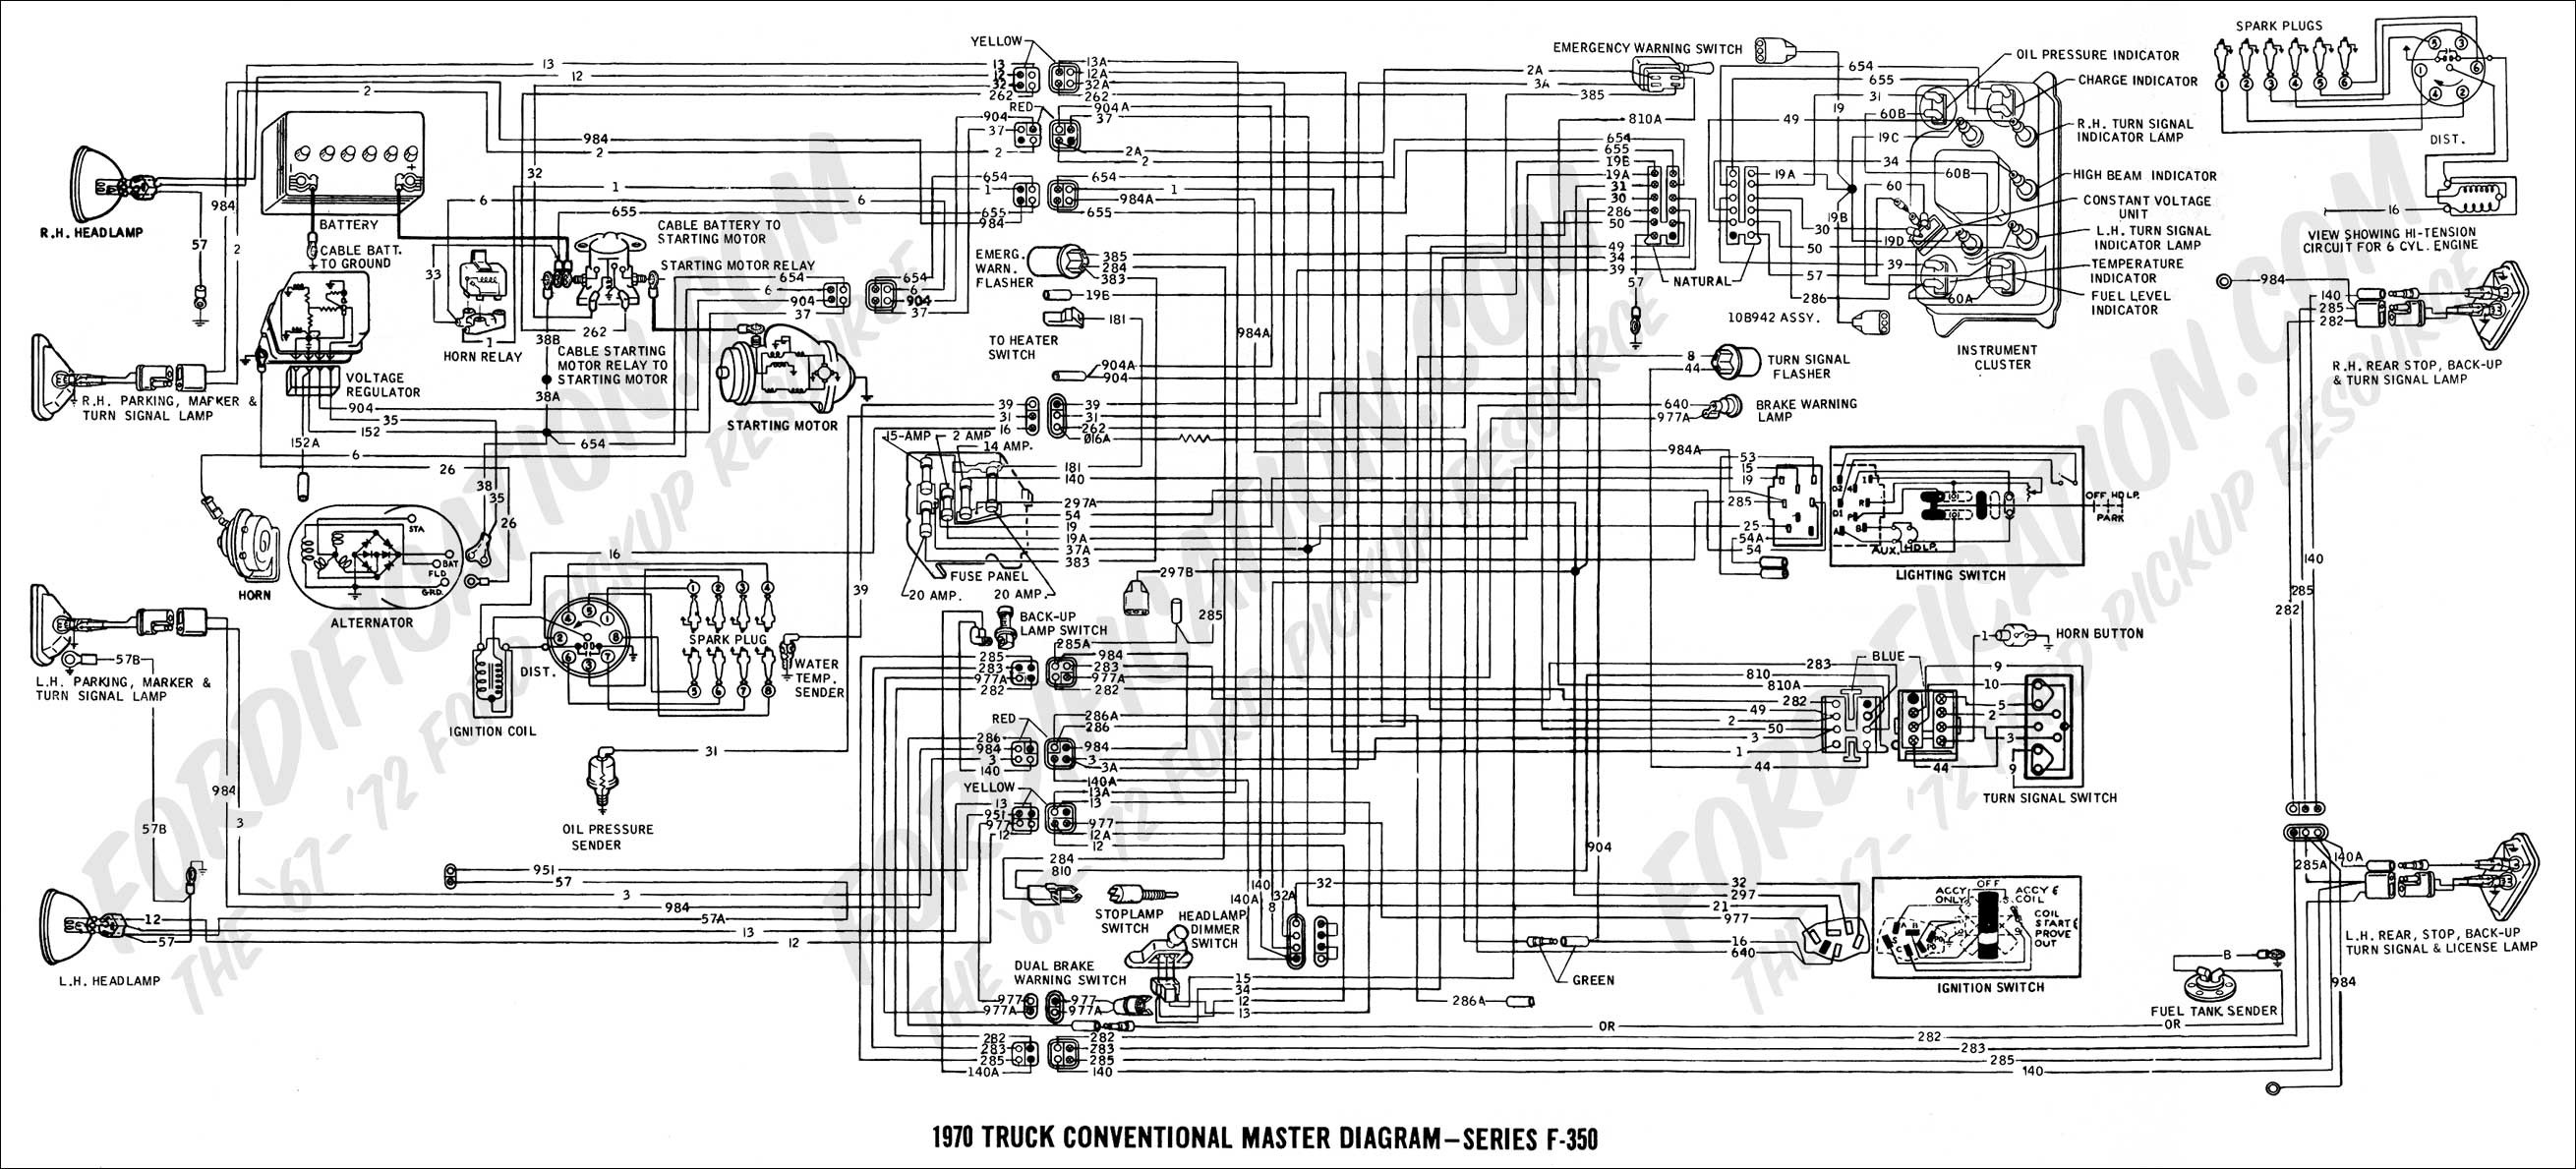 2006 Ford Ranger Wiring Diagram 3 In 97 Trailer